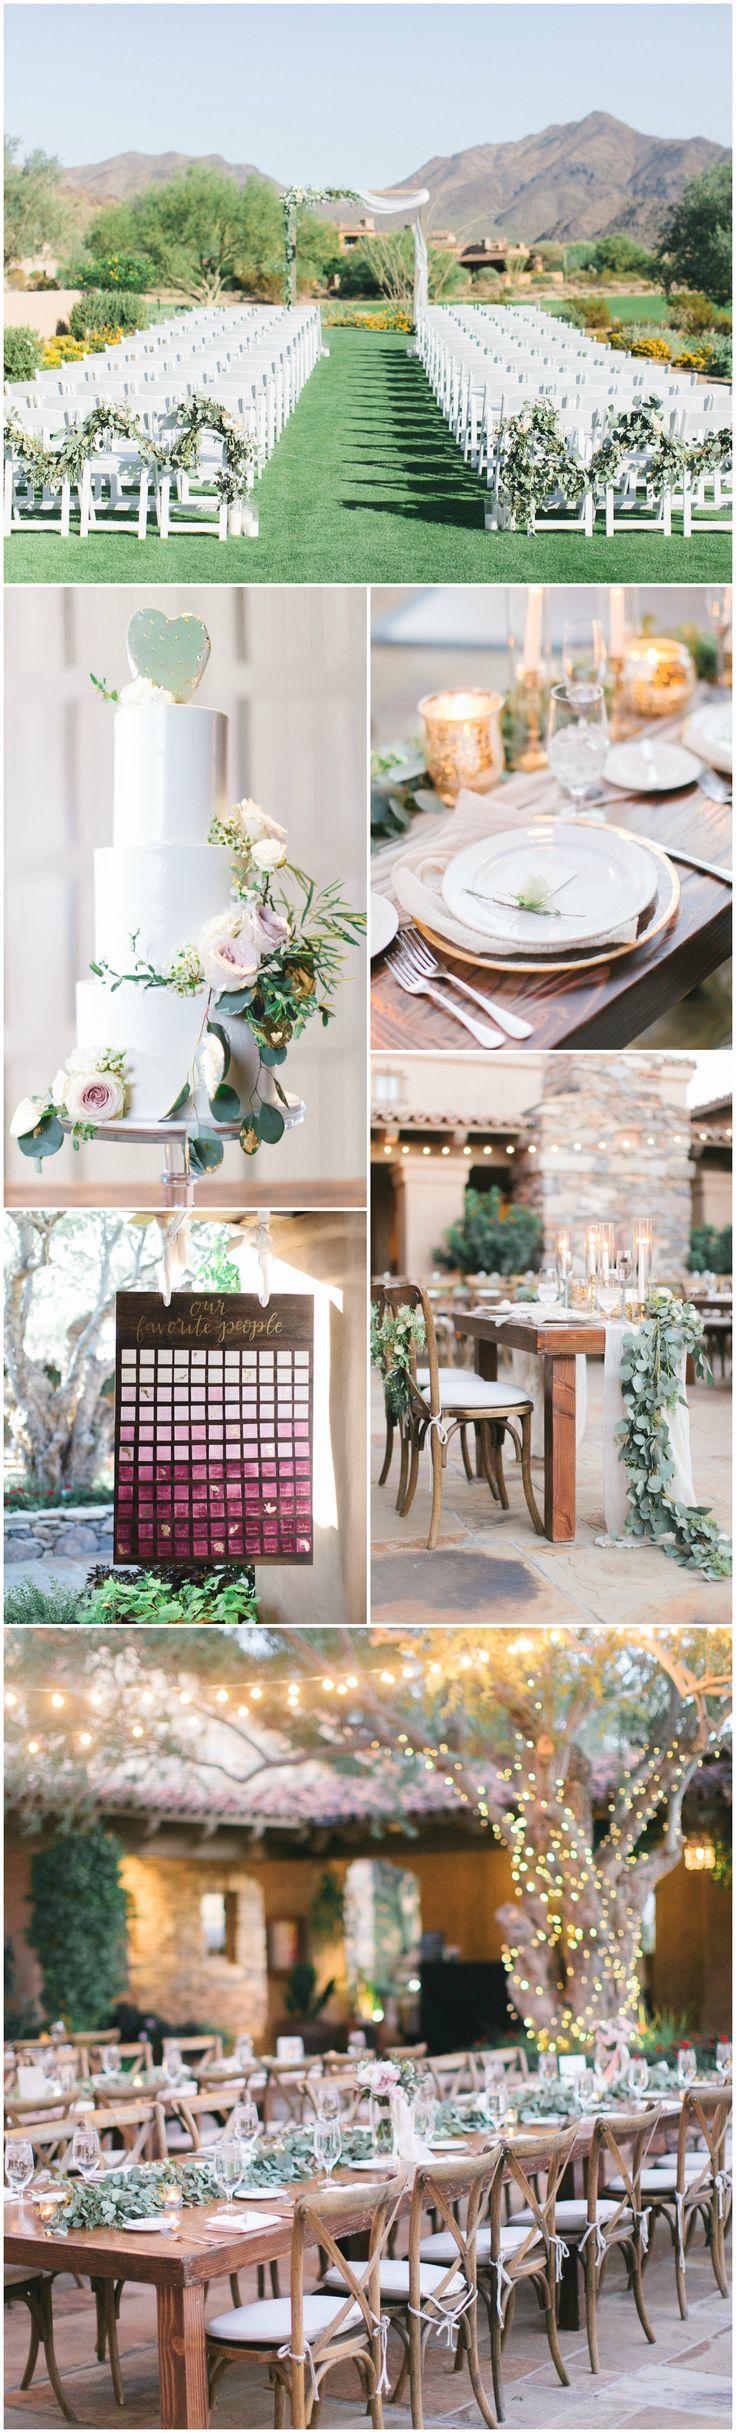 Phoenix, Arizona wedding, green lawn, hanging white lights, farm tables, cactus cake, wooden x-back chairs, eucalyptus leaves // Andrew Jade Photo